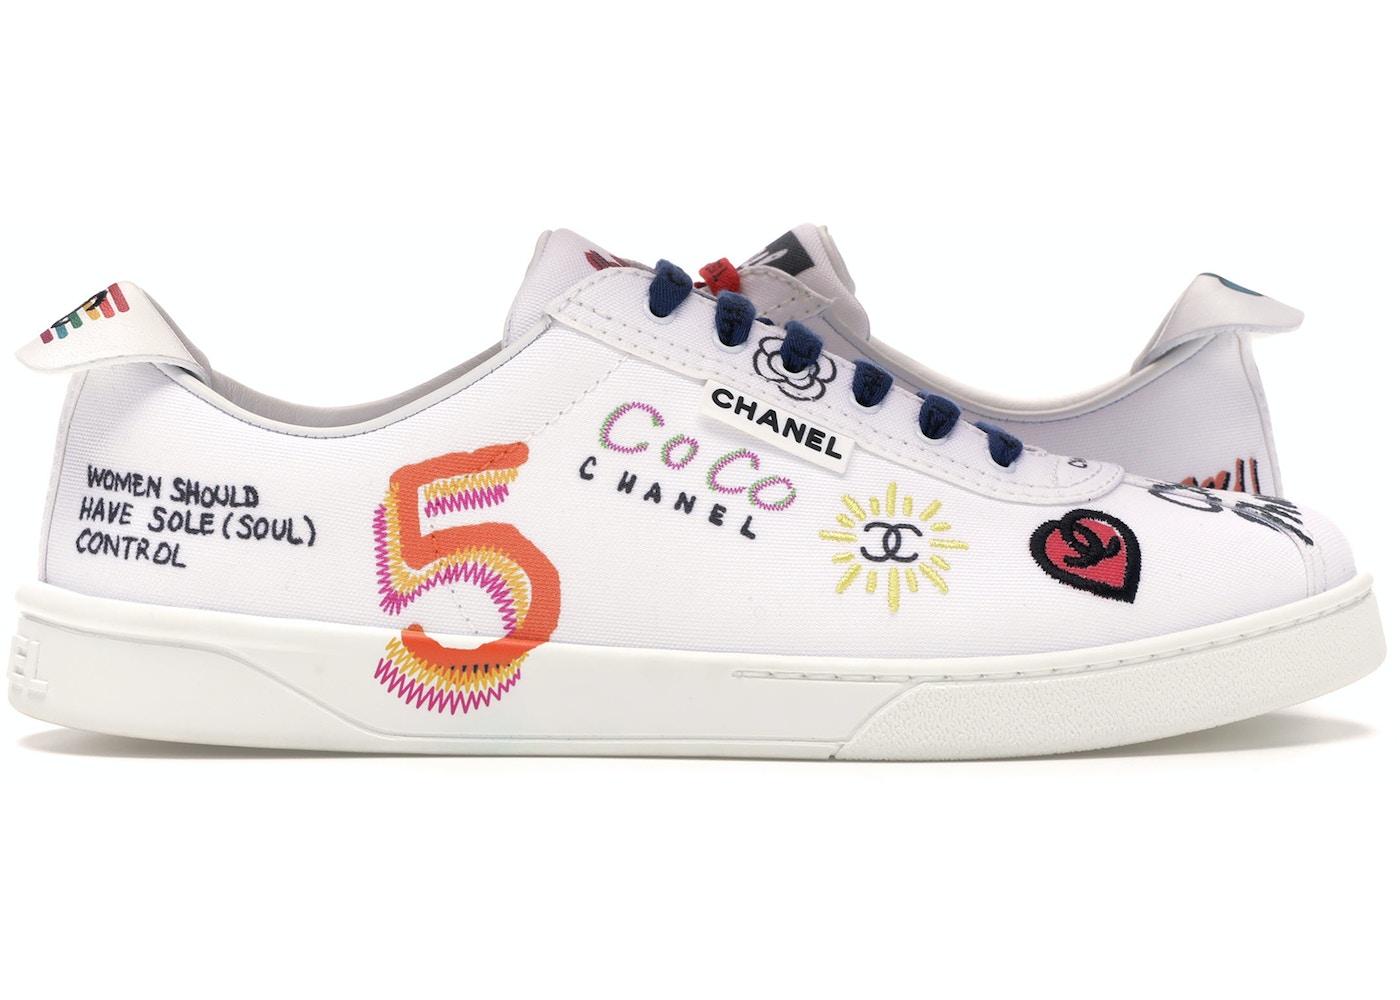 Chanel Sneakers Pharrell White Multi Color 19d G34878x53027 C2340 10b